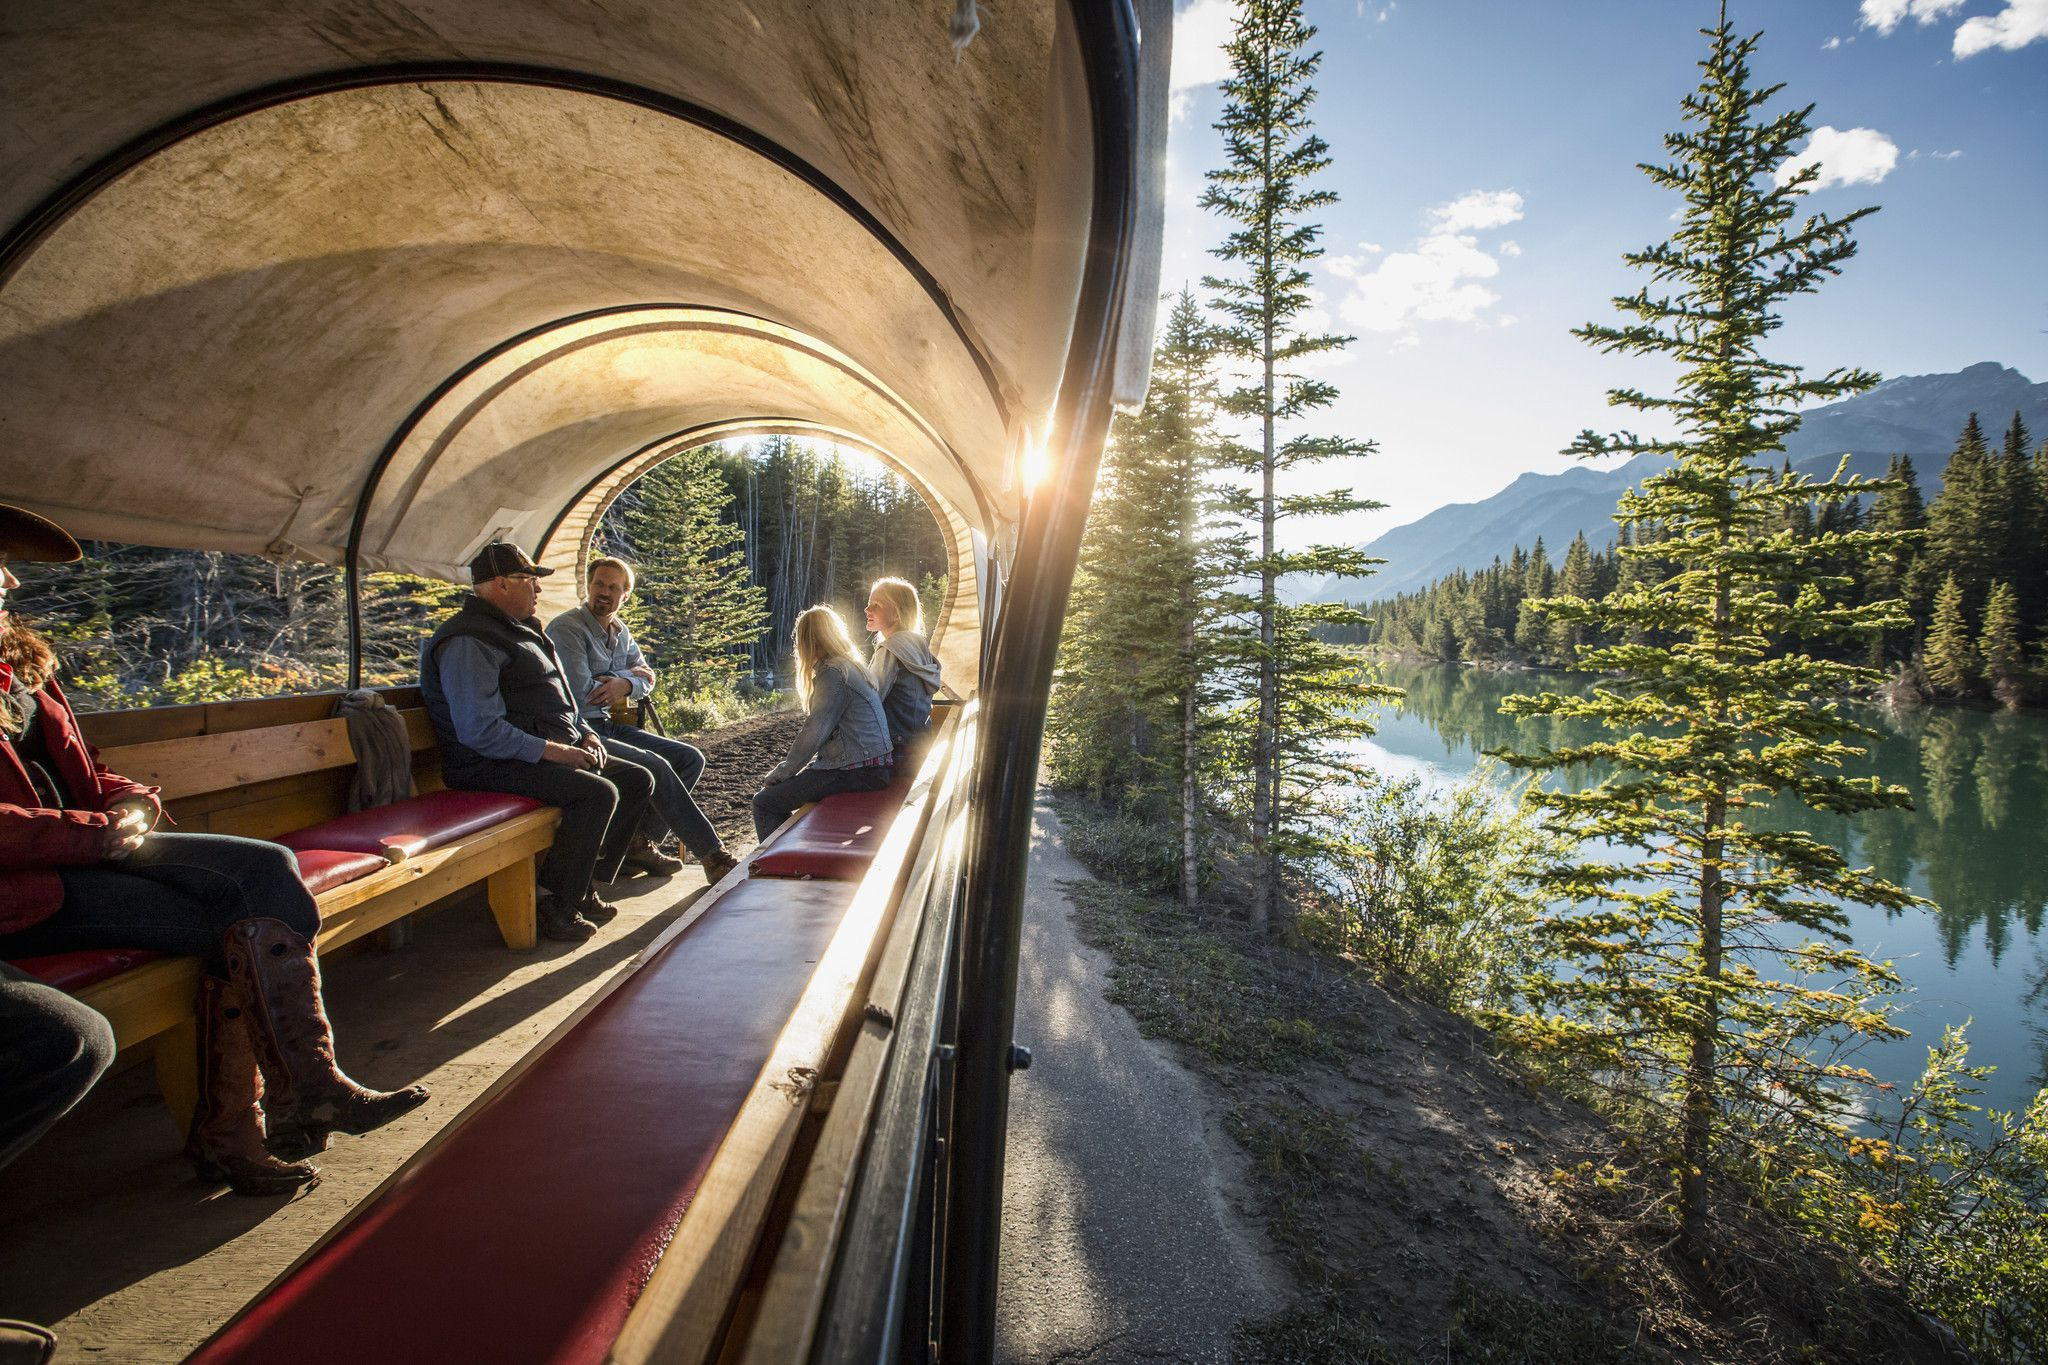 Alberta captures spirit, adventure of Canada's Wild West